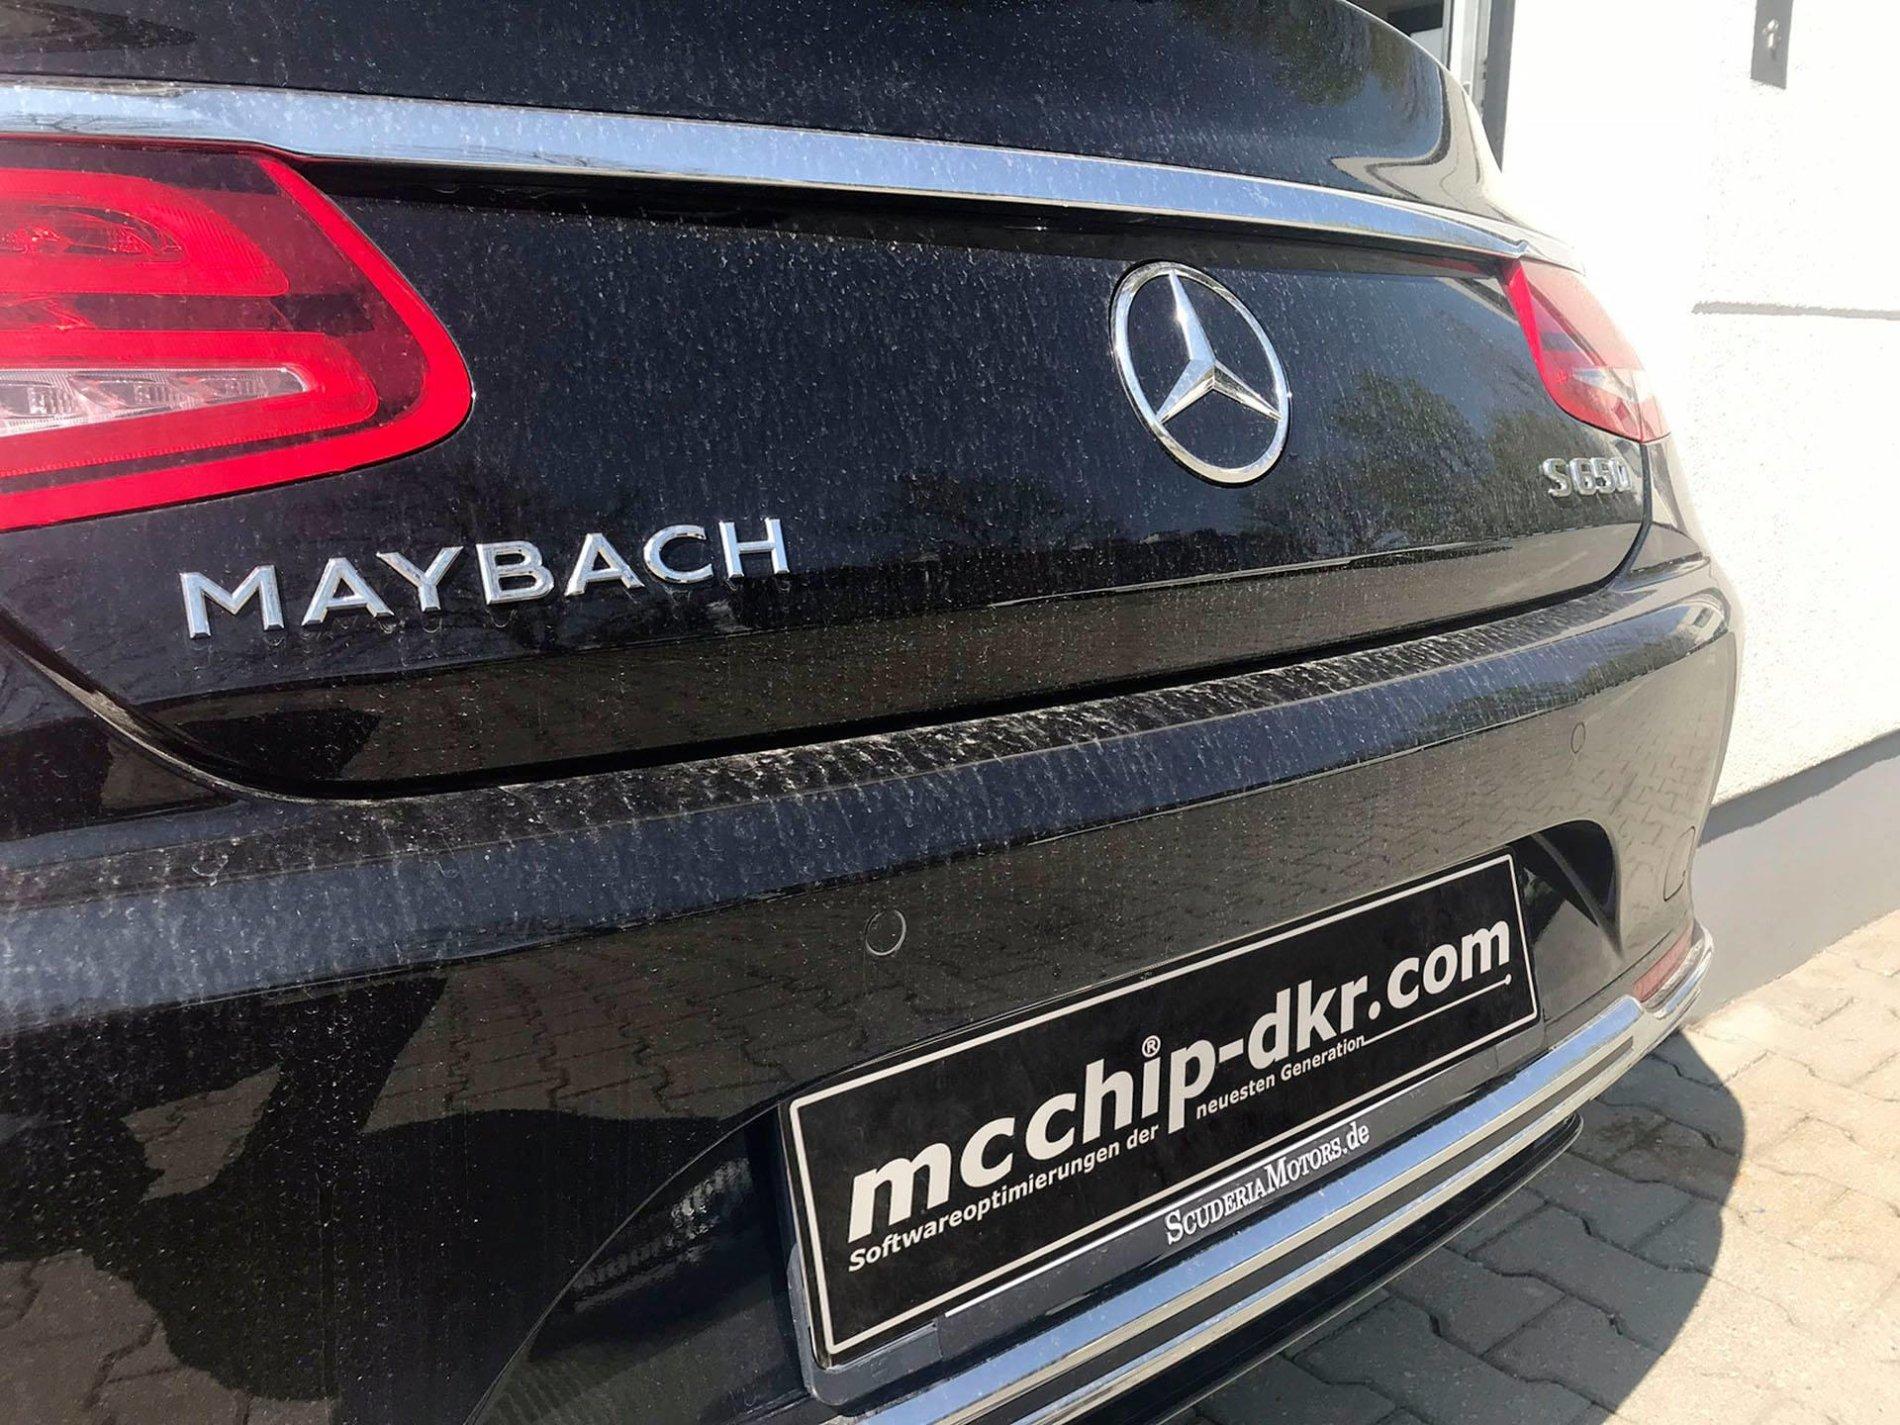 Maybach S650 Cabrio de 708 CP - Maybach S650 Cabrio de 708 CP